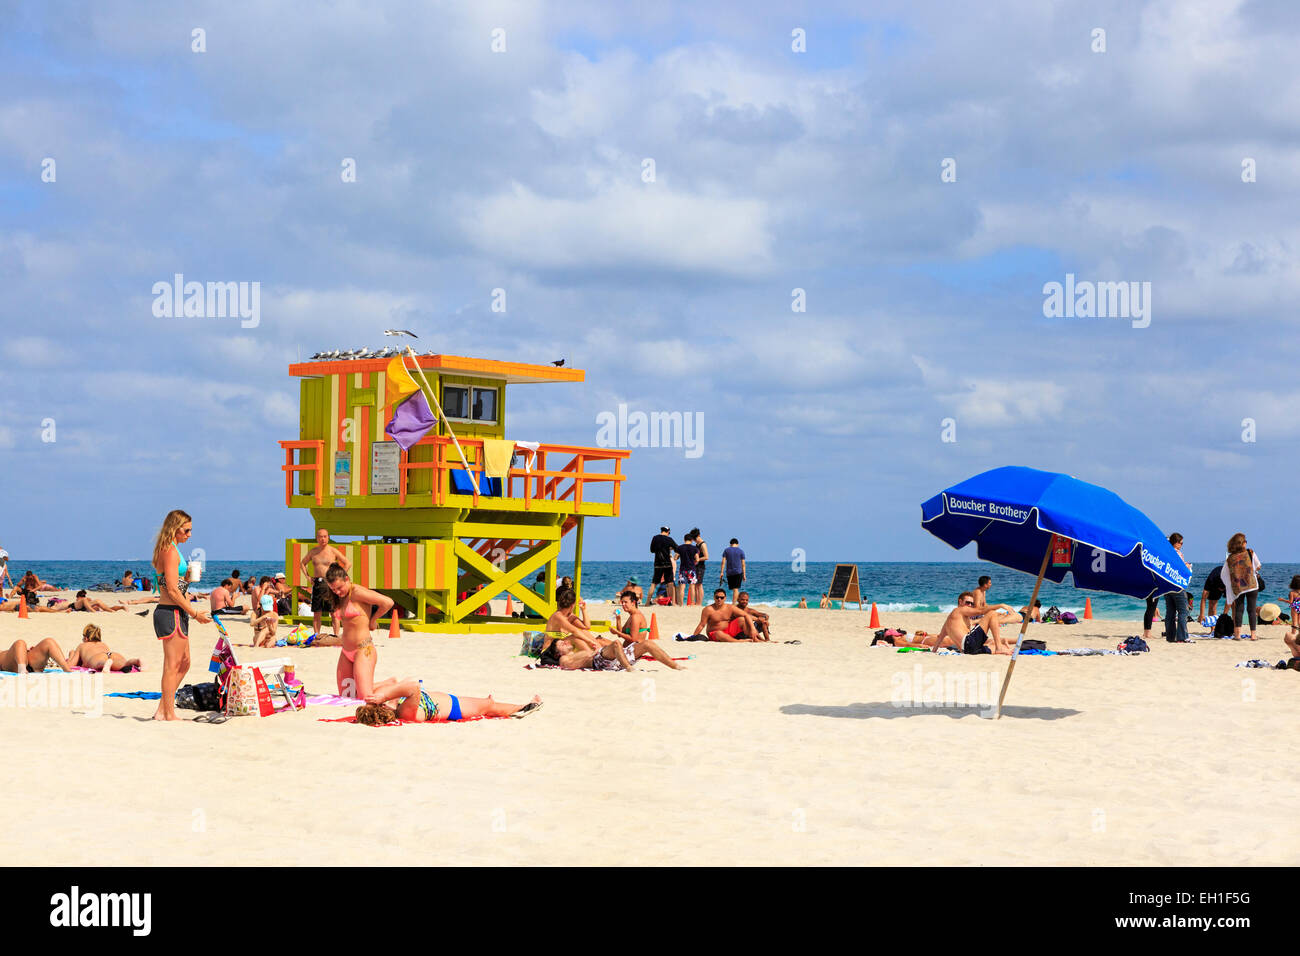 Tourists sunbathing on South Beach, Miami, Florida, USA - Stock Image